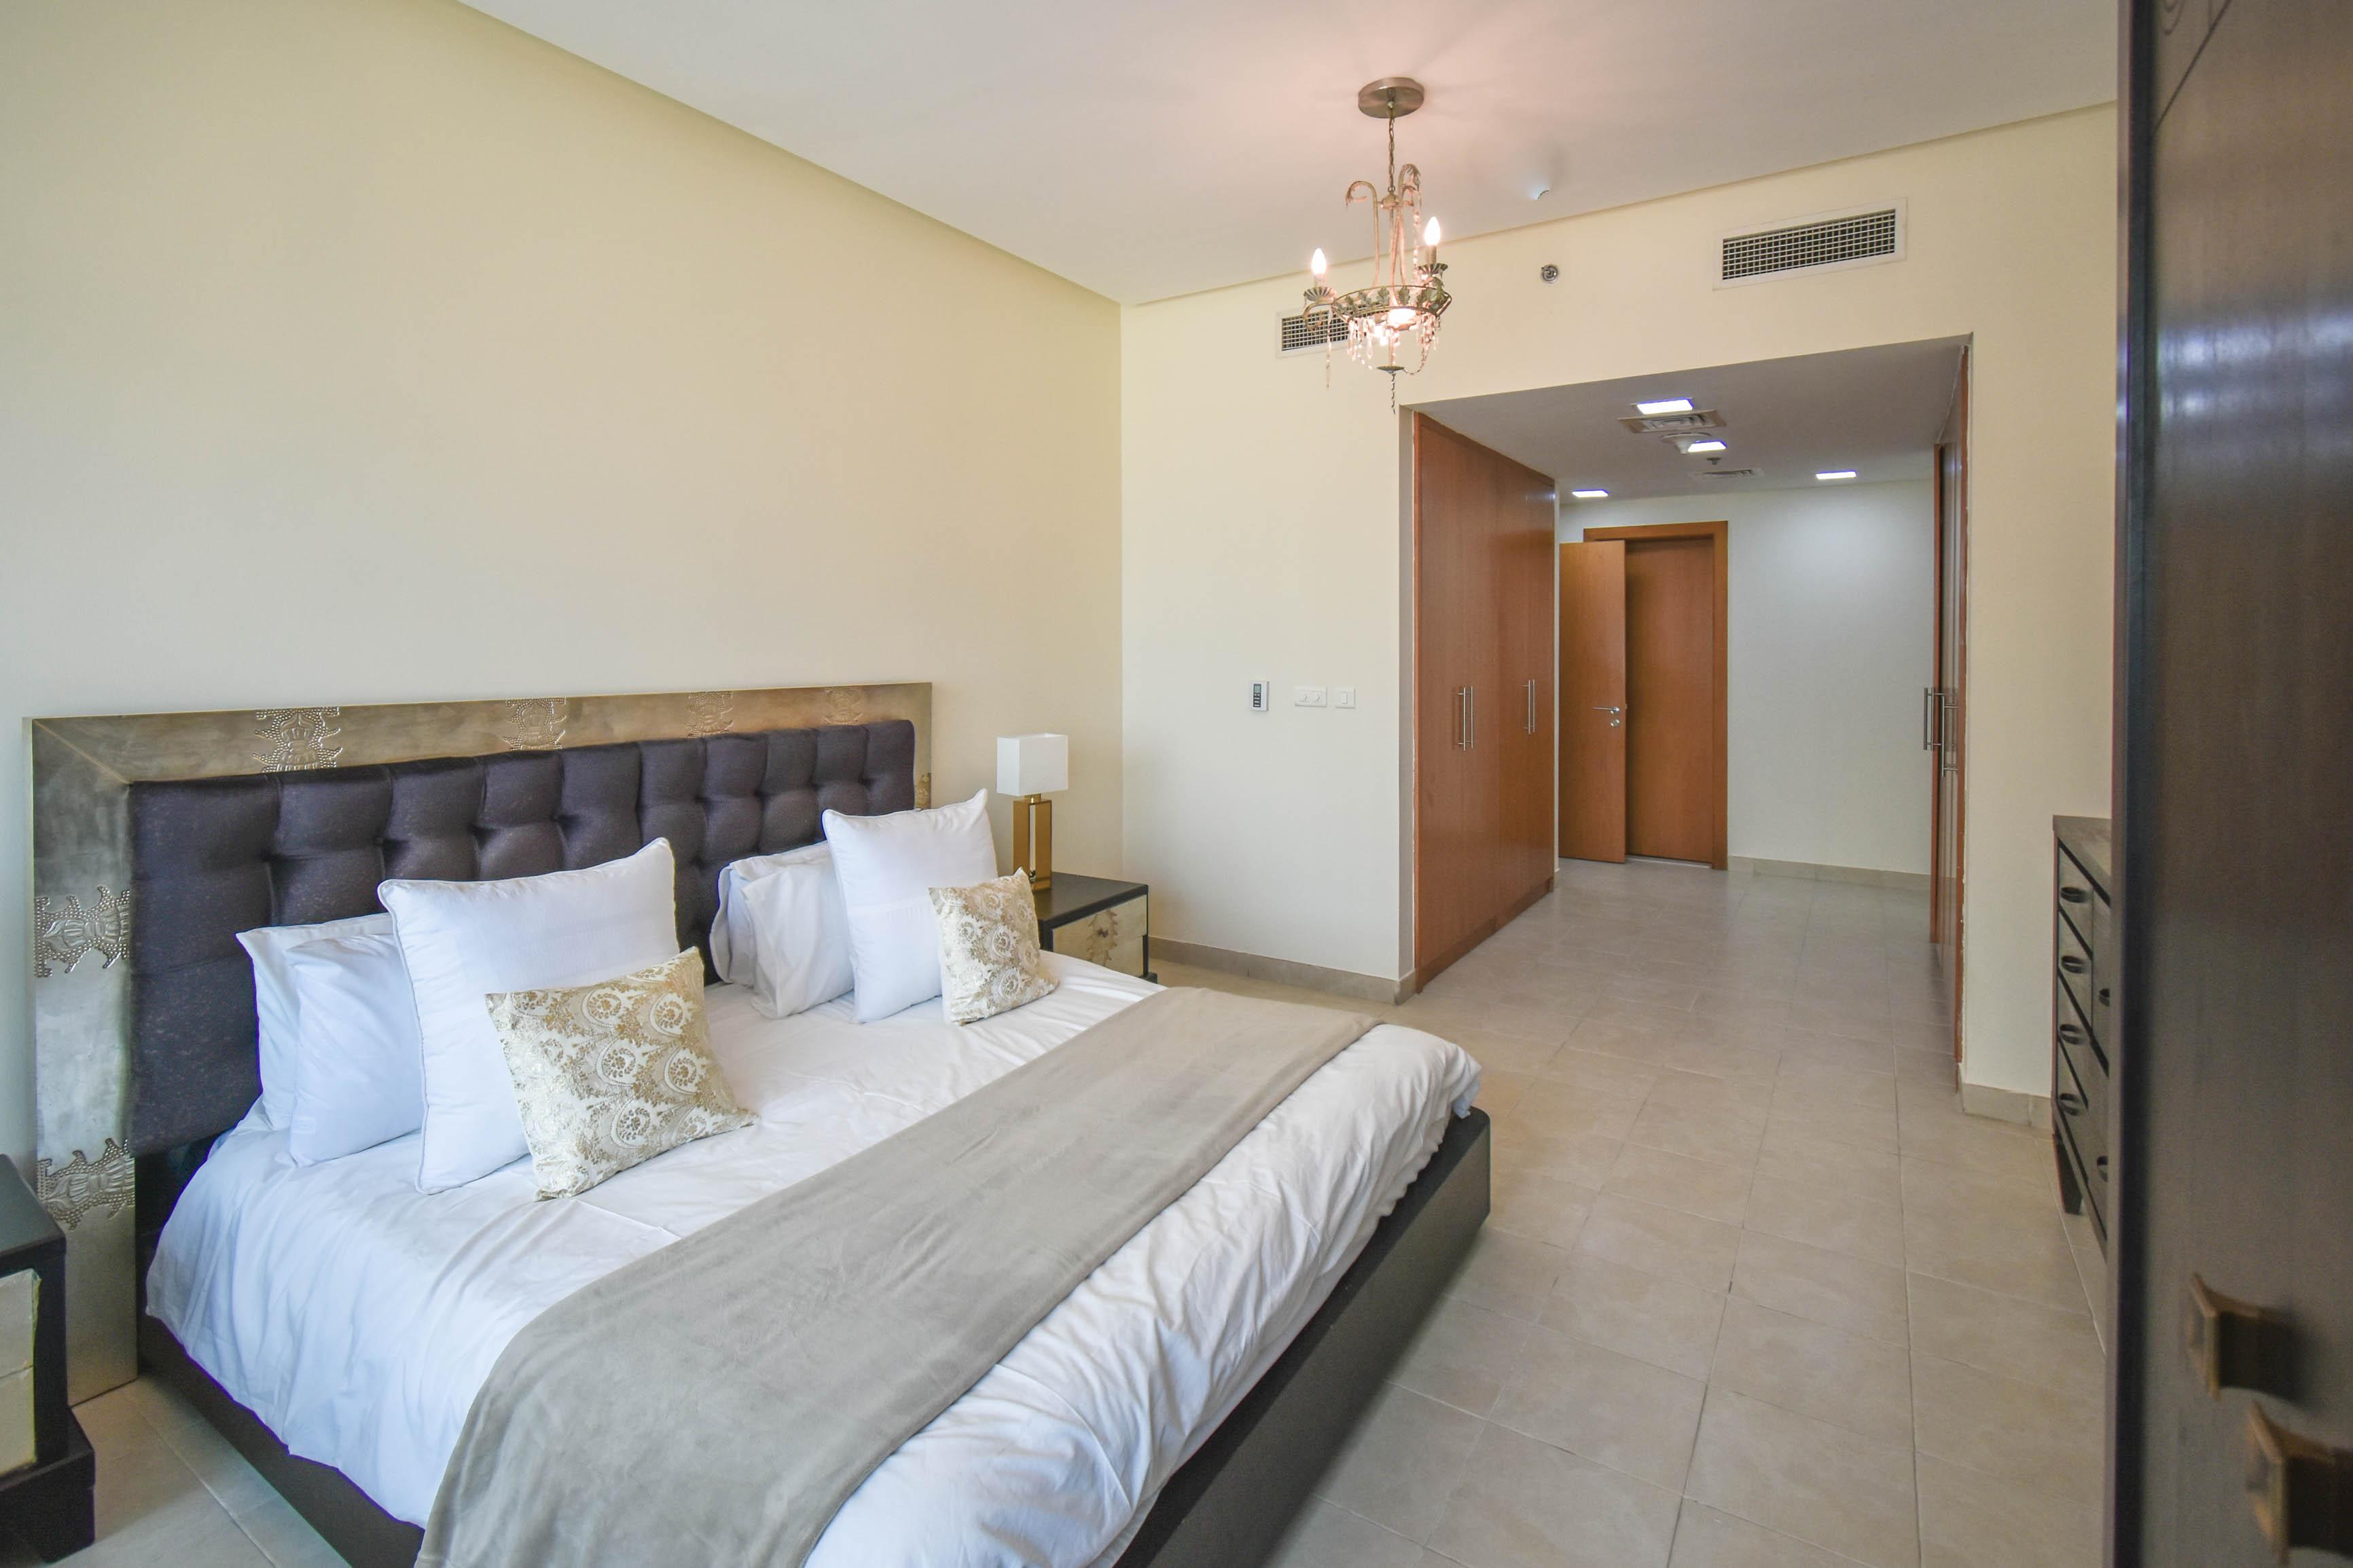 Dubai Spacious 2 bedrooms JLT 4